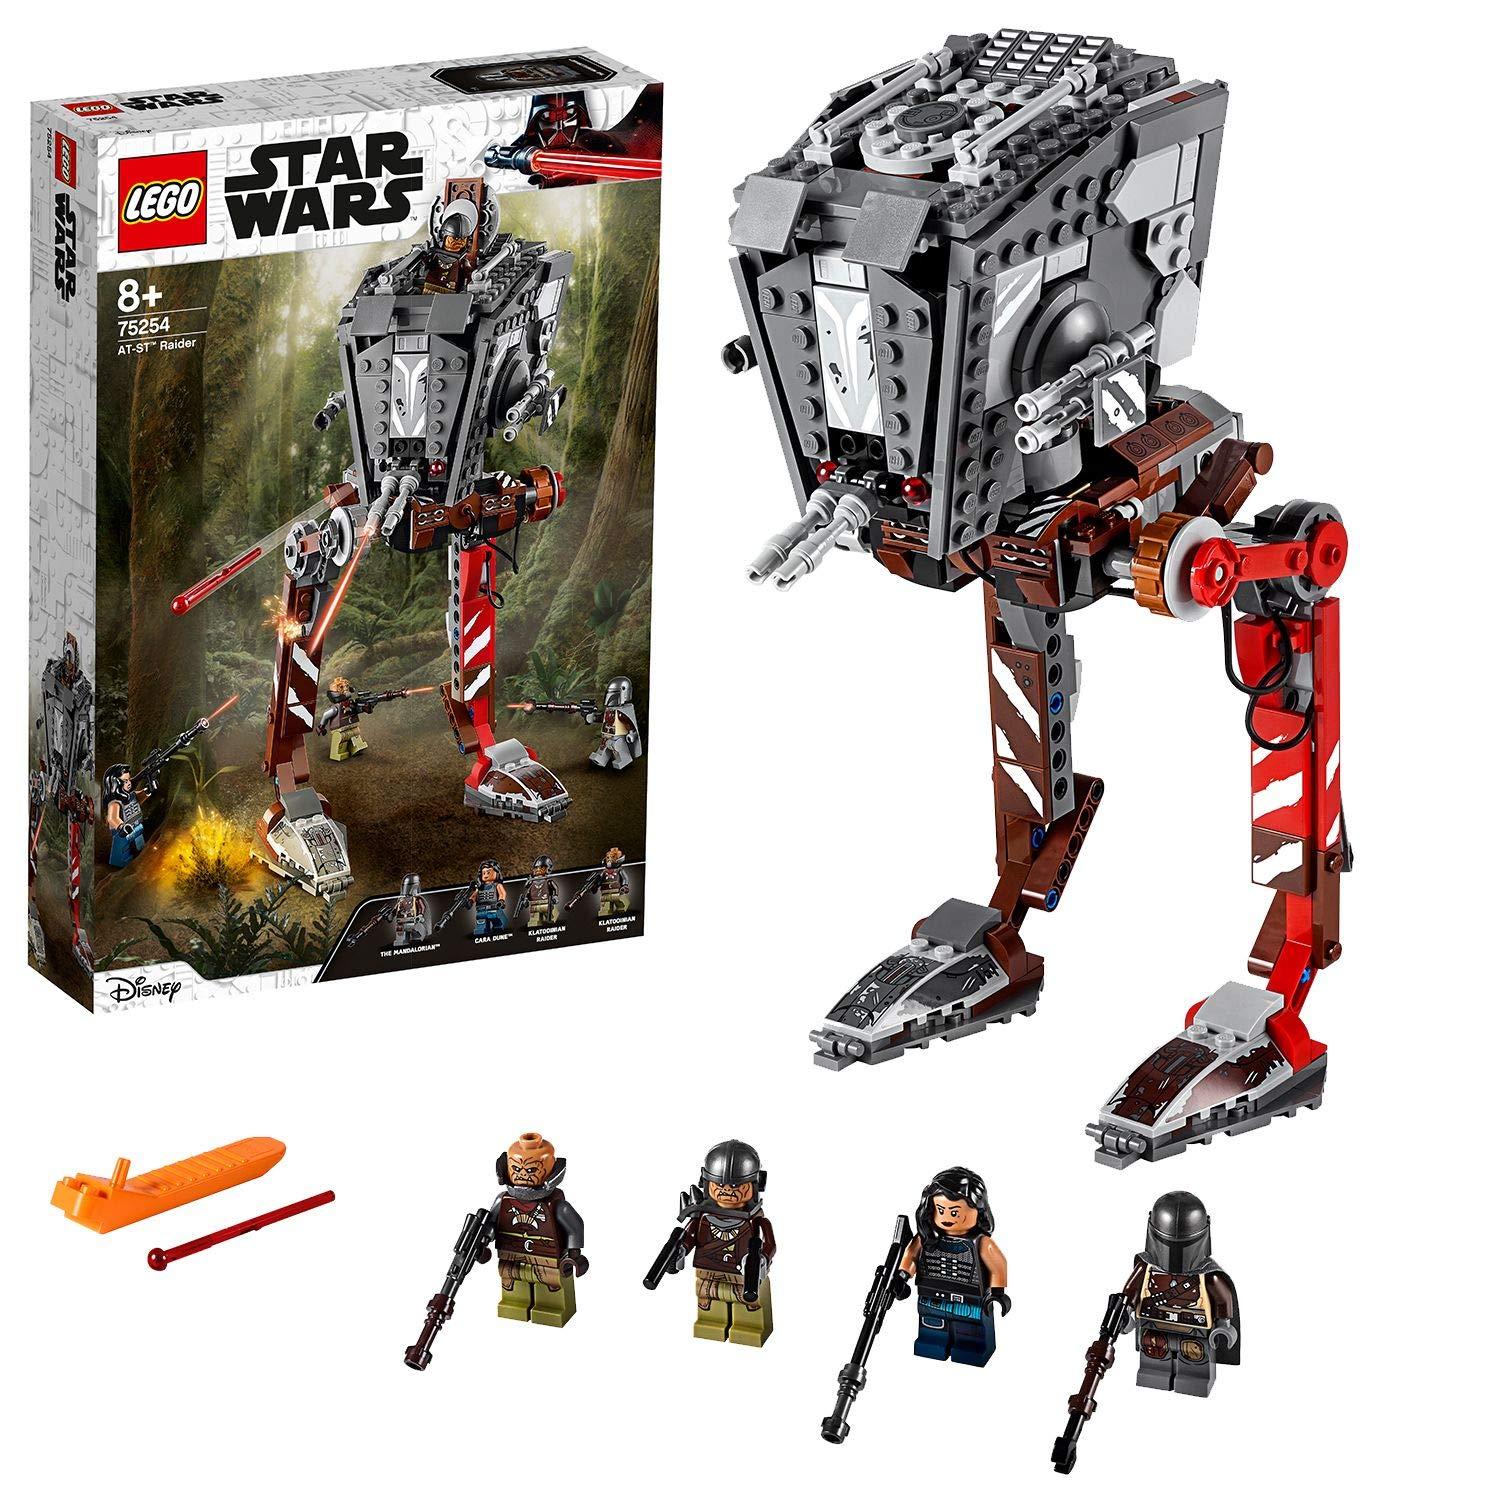 LEGO 75254 Star Wars AT-ST Raider Vehicle (The Mandalorian TV Series) Set £39.99 @ Amazon